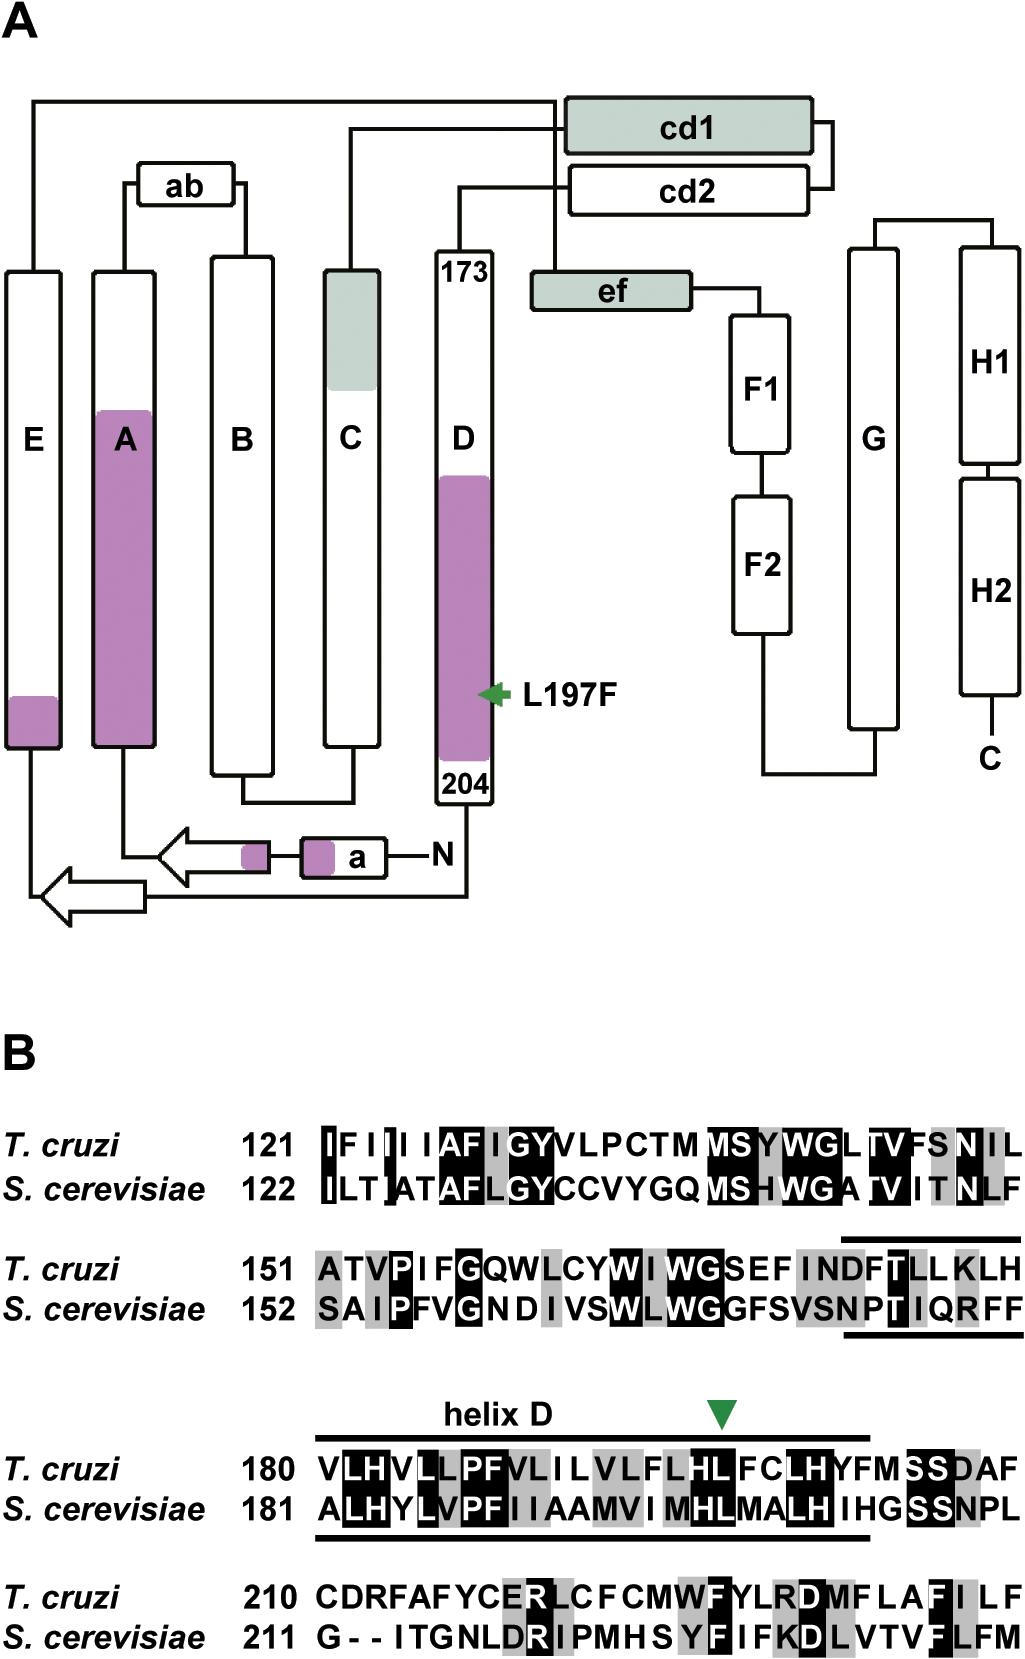 GNF7686 resistance-conferring mutation in <i>T</i>. <i>cruzi</i> cytochrome <i>b</i> structure.